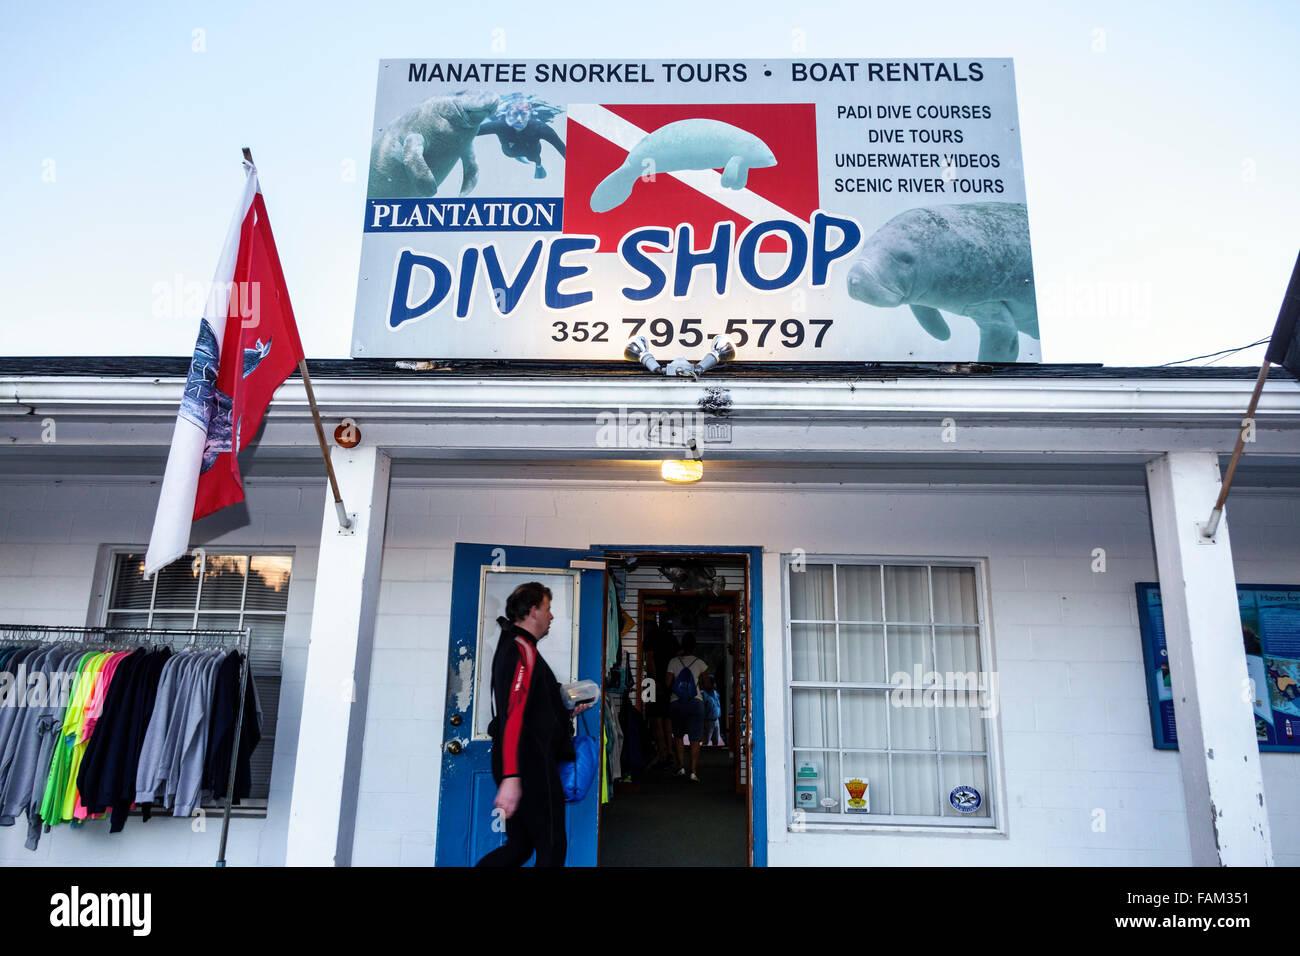 Florida Crystal River Plantation Dive Shop ingresso anteriore manatee tour di snorkelling Immagini Stock